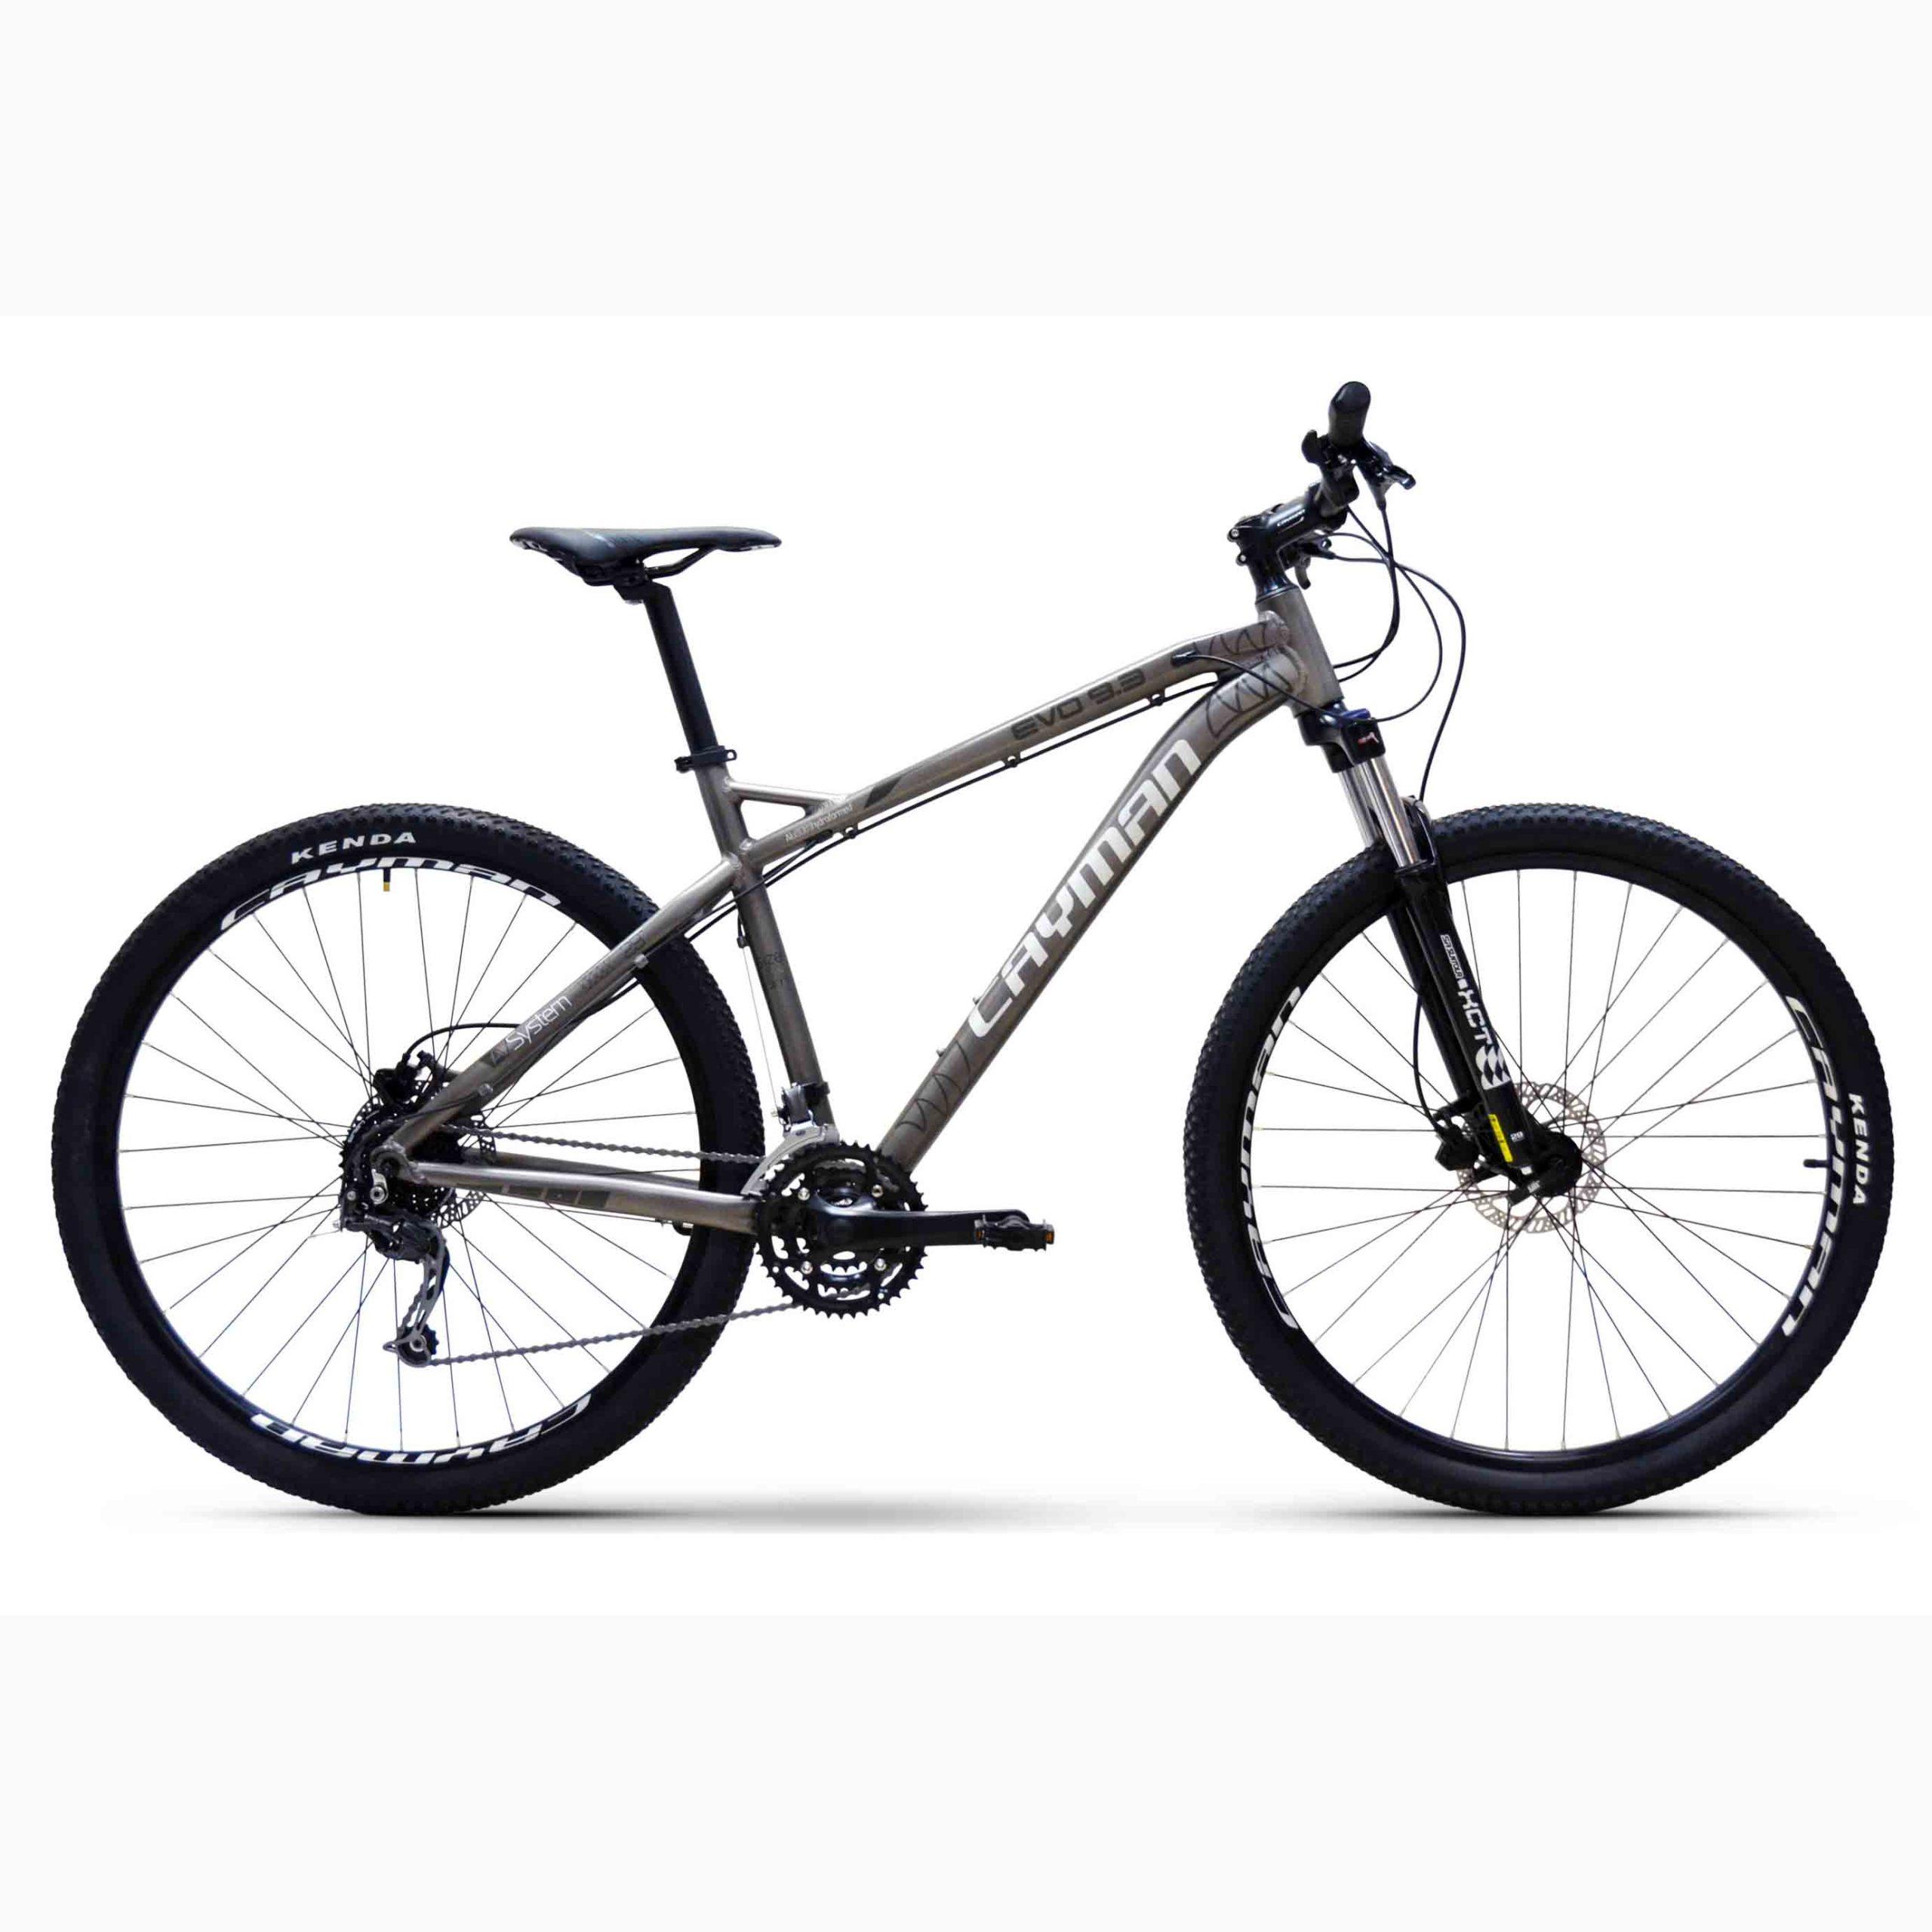 Фото Велосипед Cayman Evo 9.3 29″, рама 55см, 2018